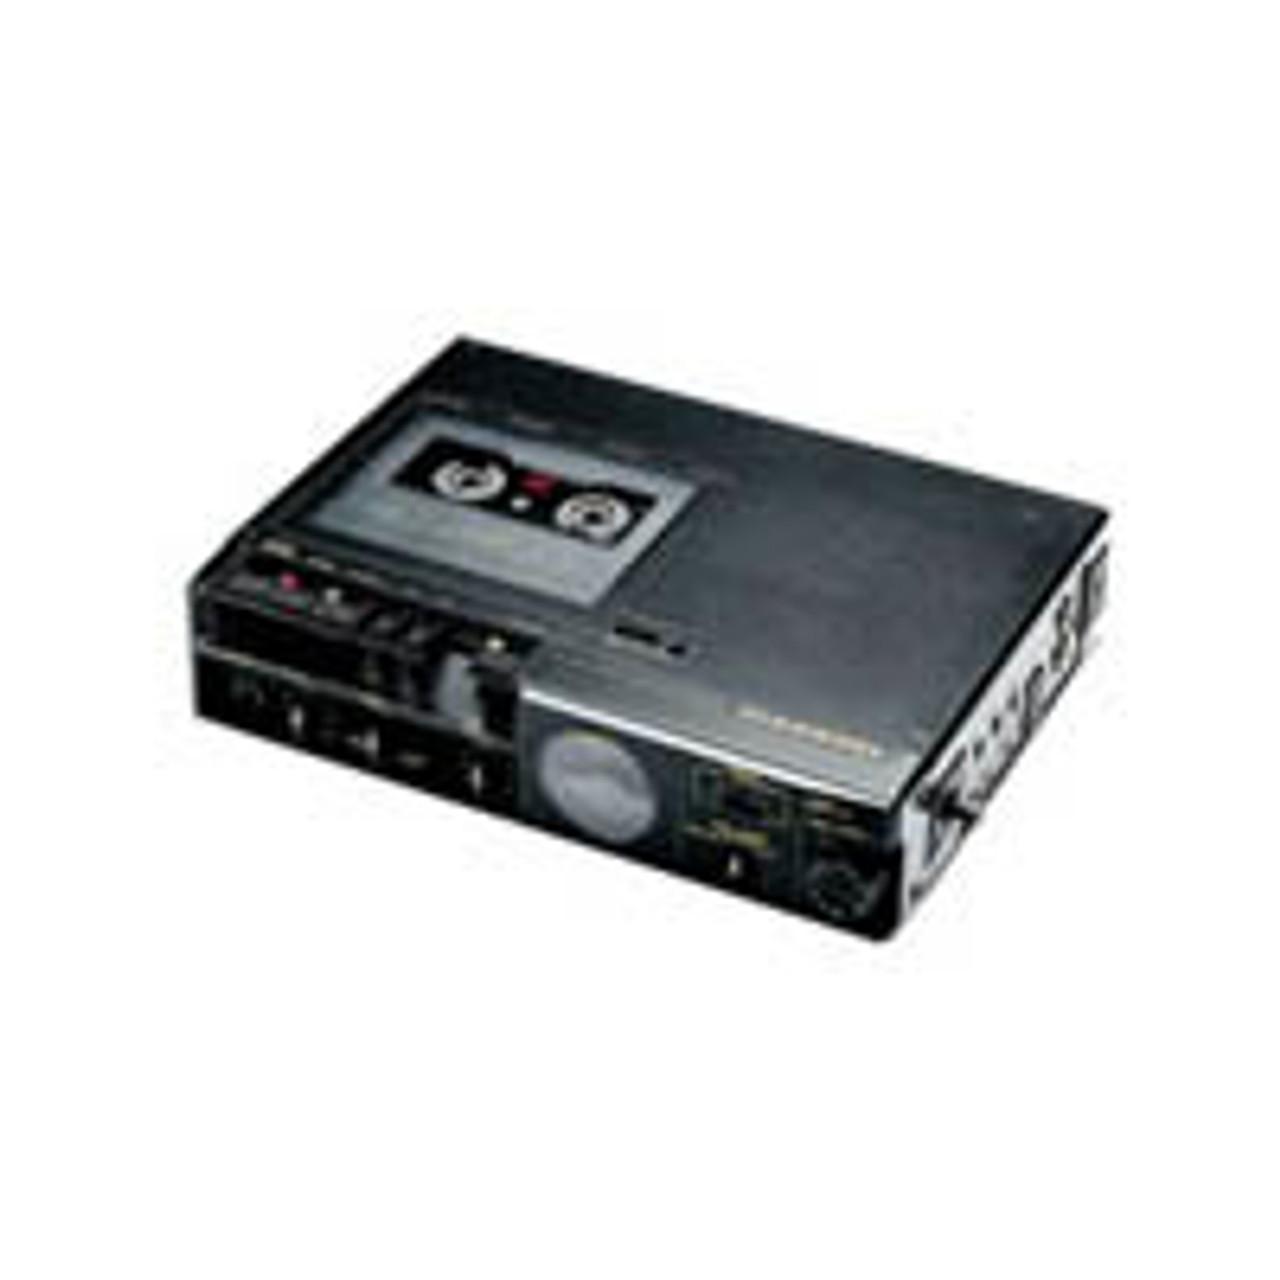 Portable Recorders